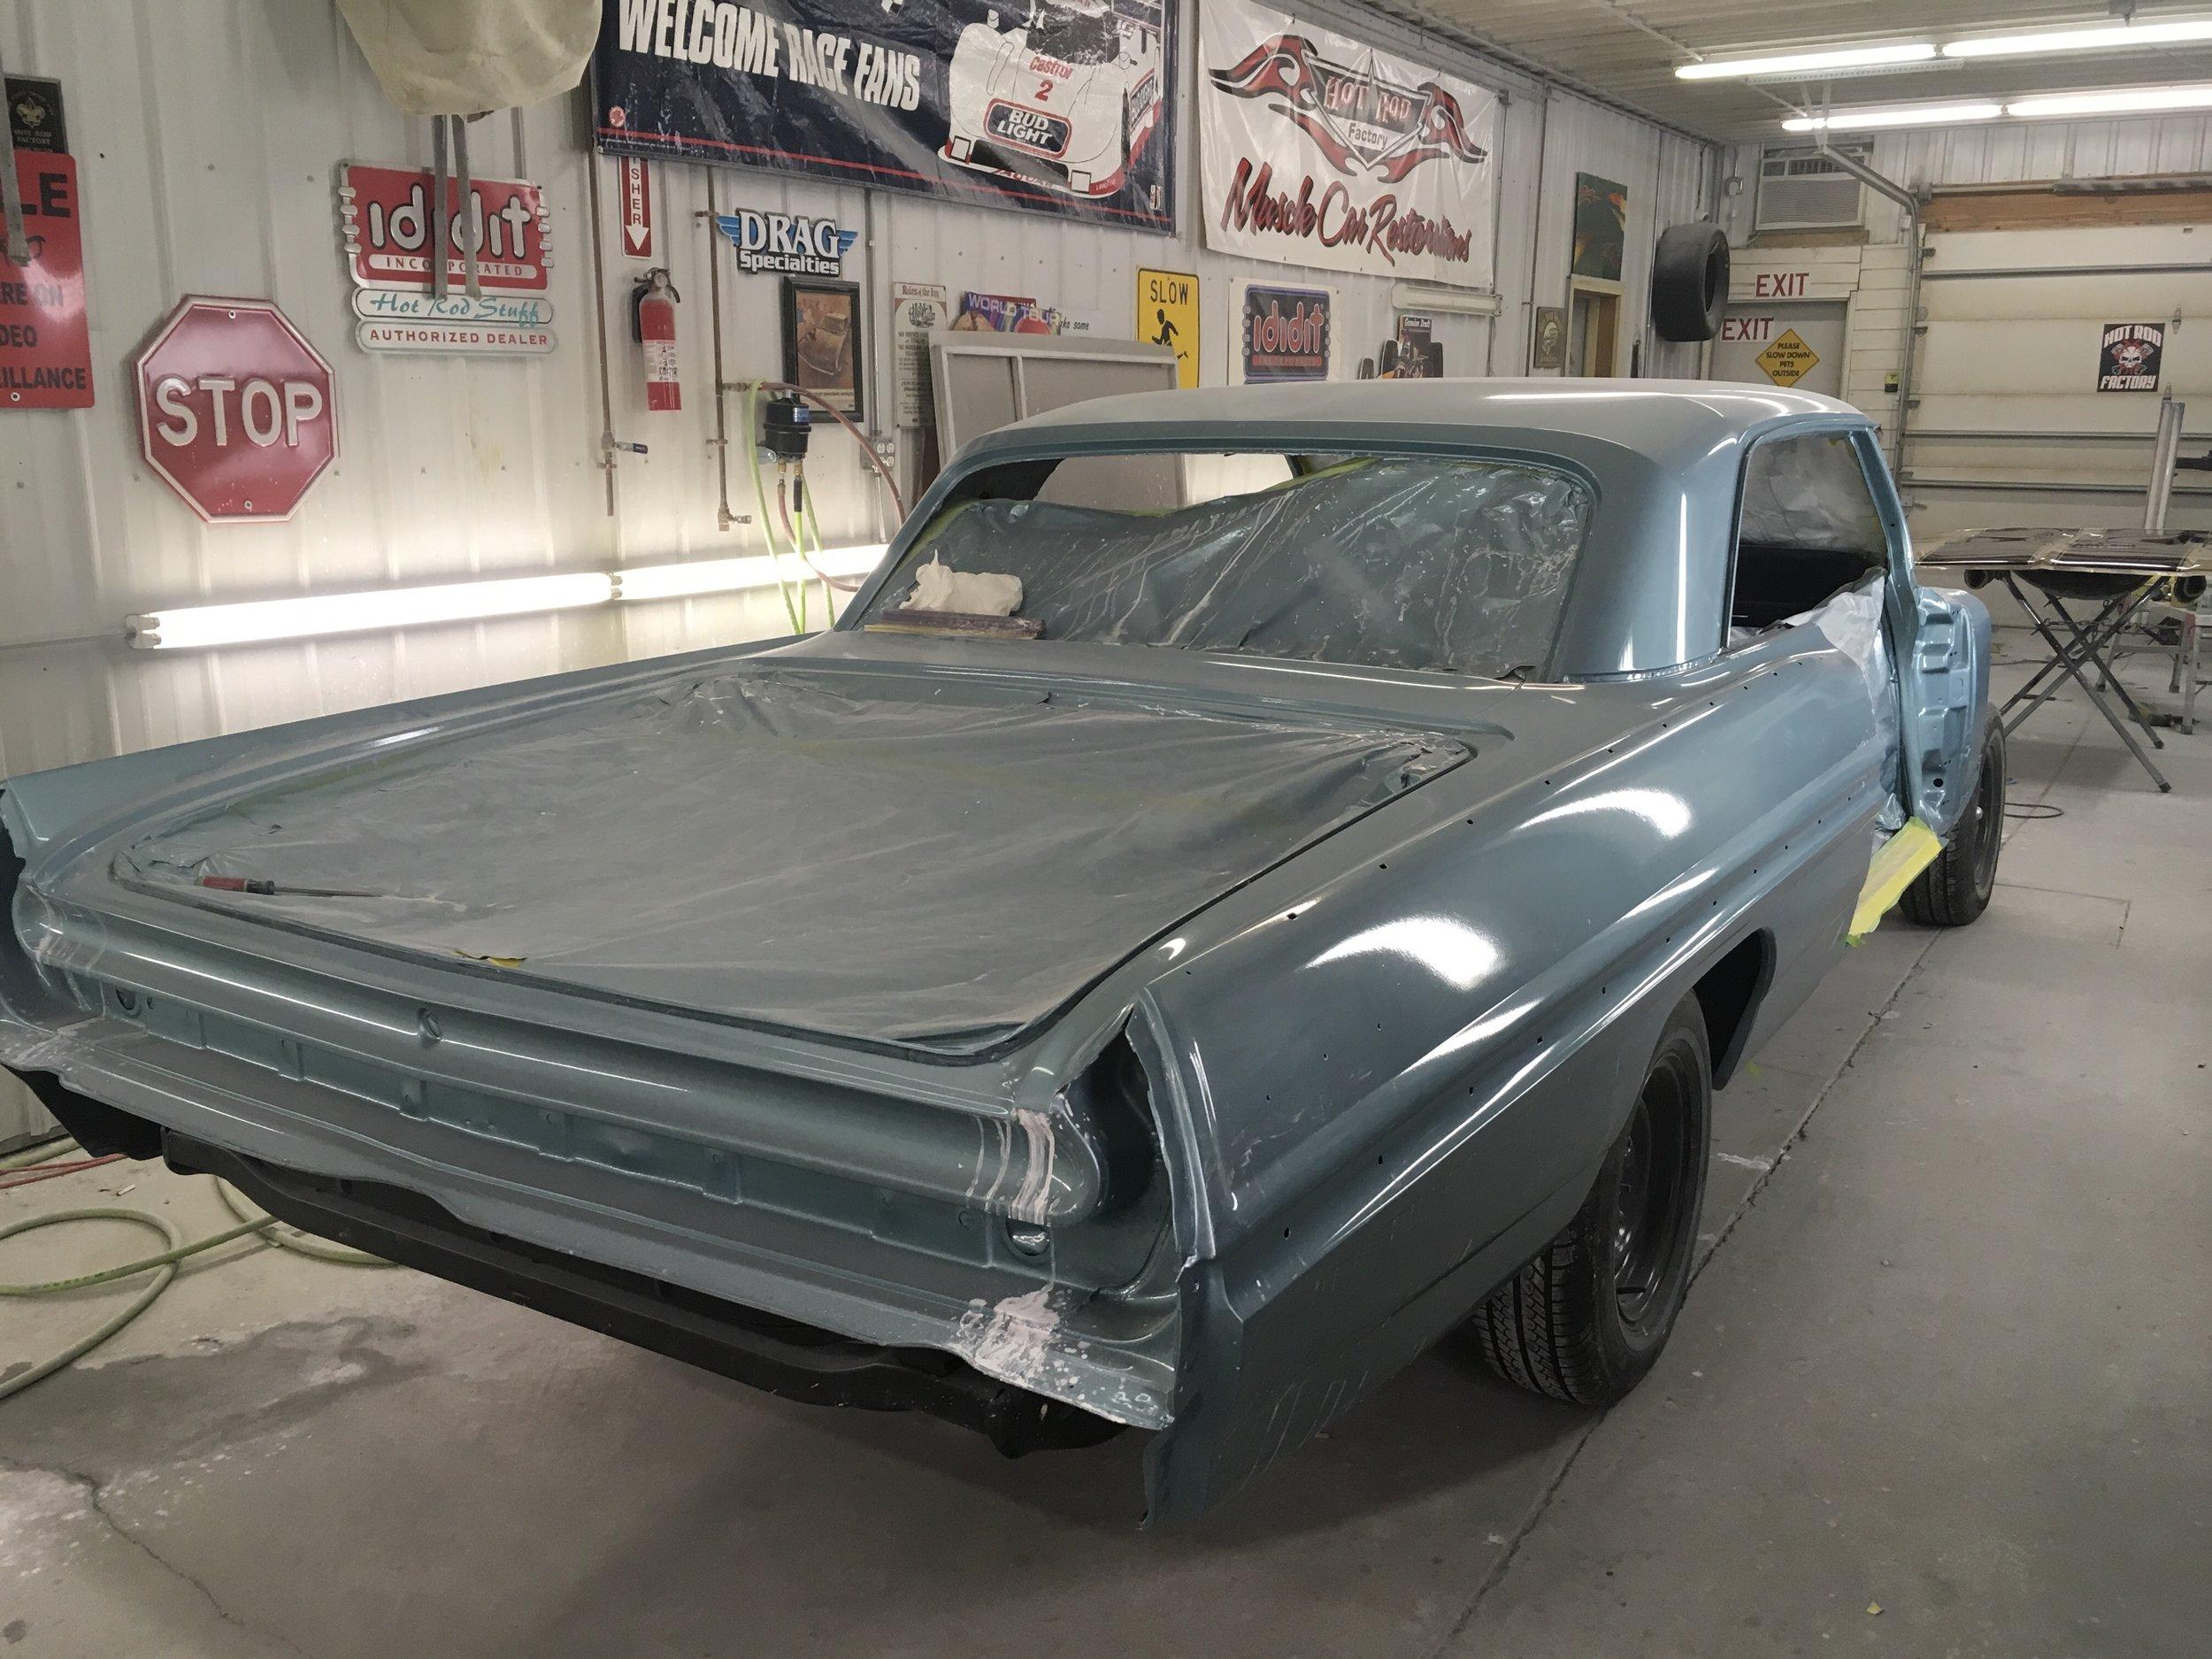 1962-pontiac-bonneville-minneapolis-hot-rod-custom-build-restoration-21.jpg